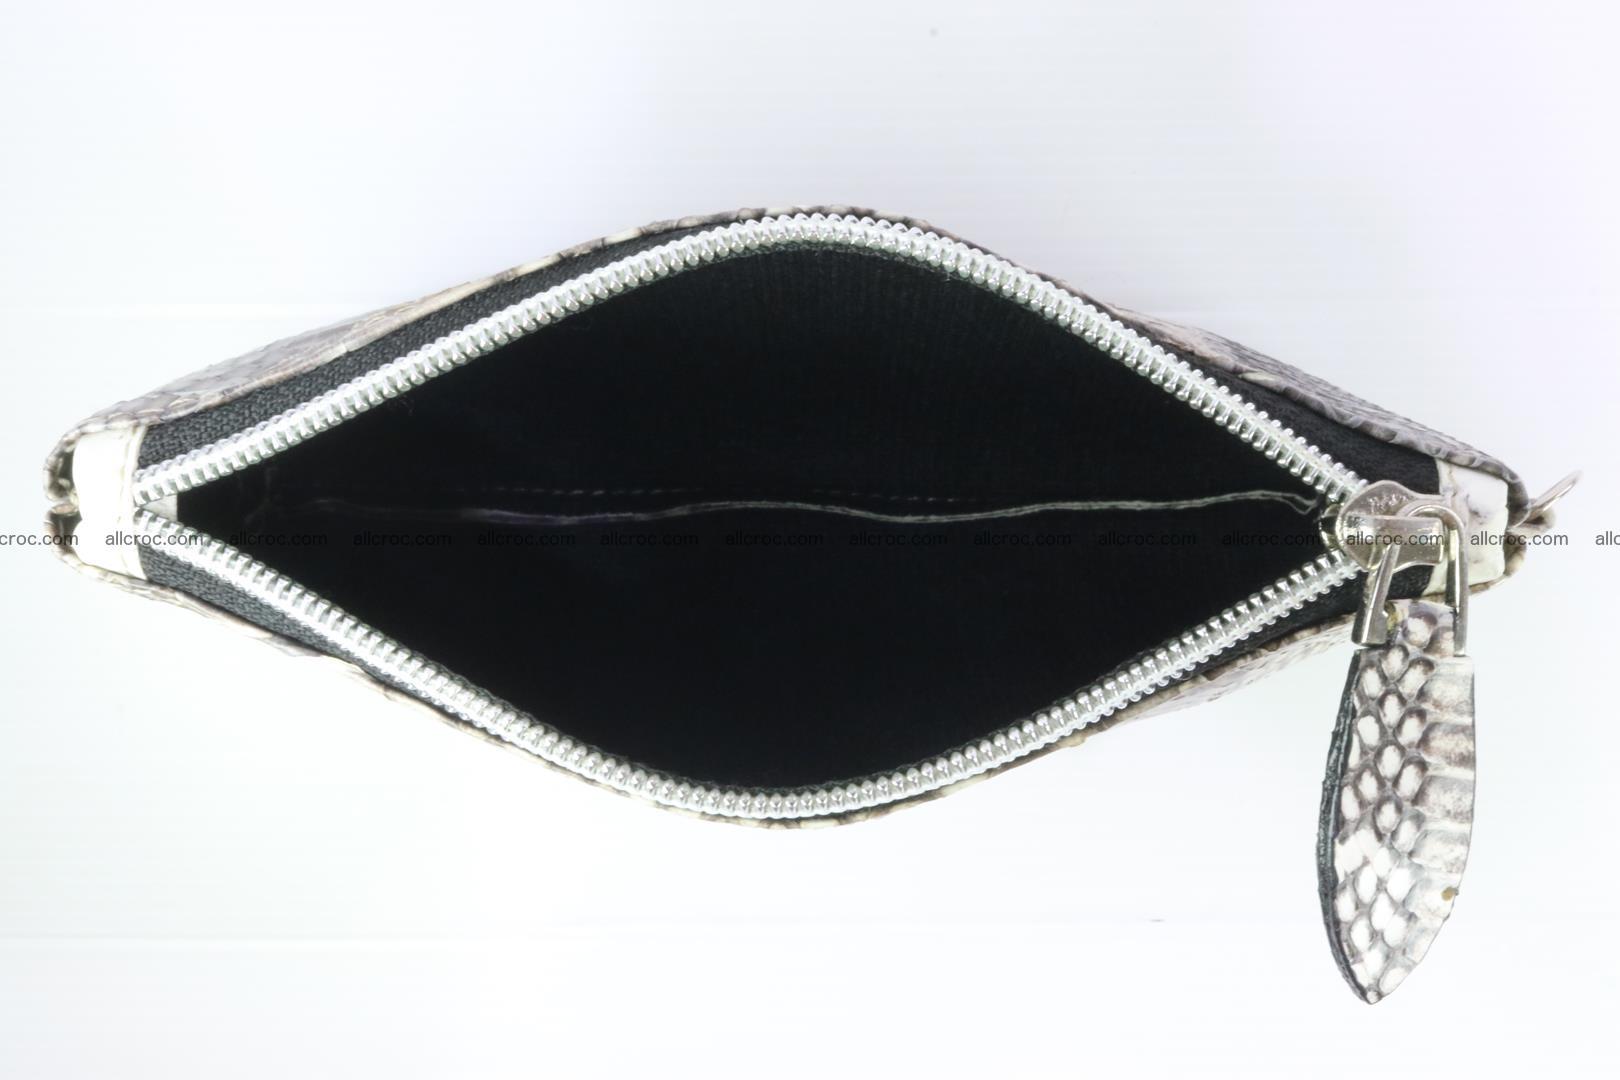 Handbag from cobra skin for lady 183 Foto 20